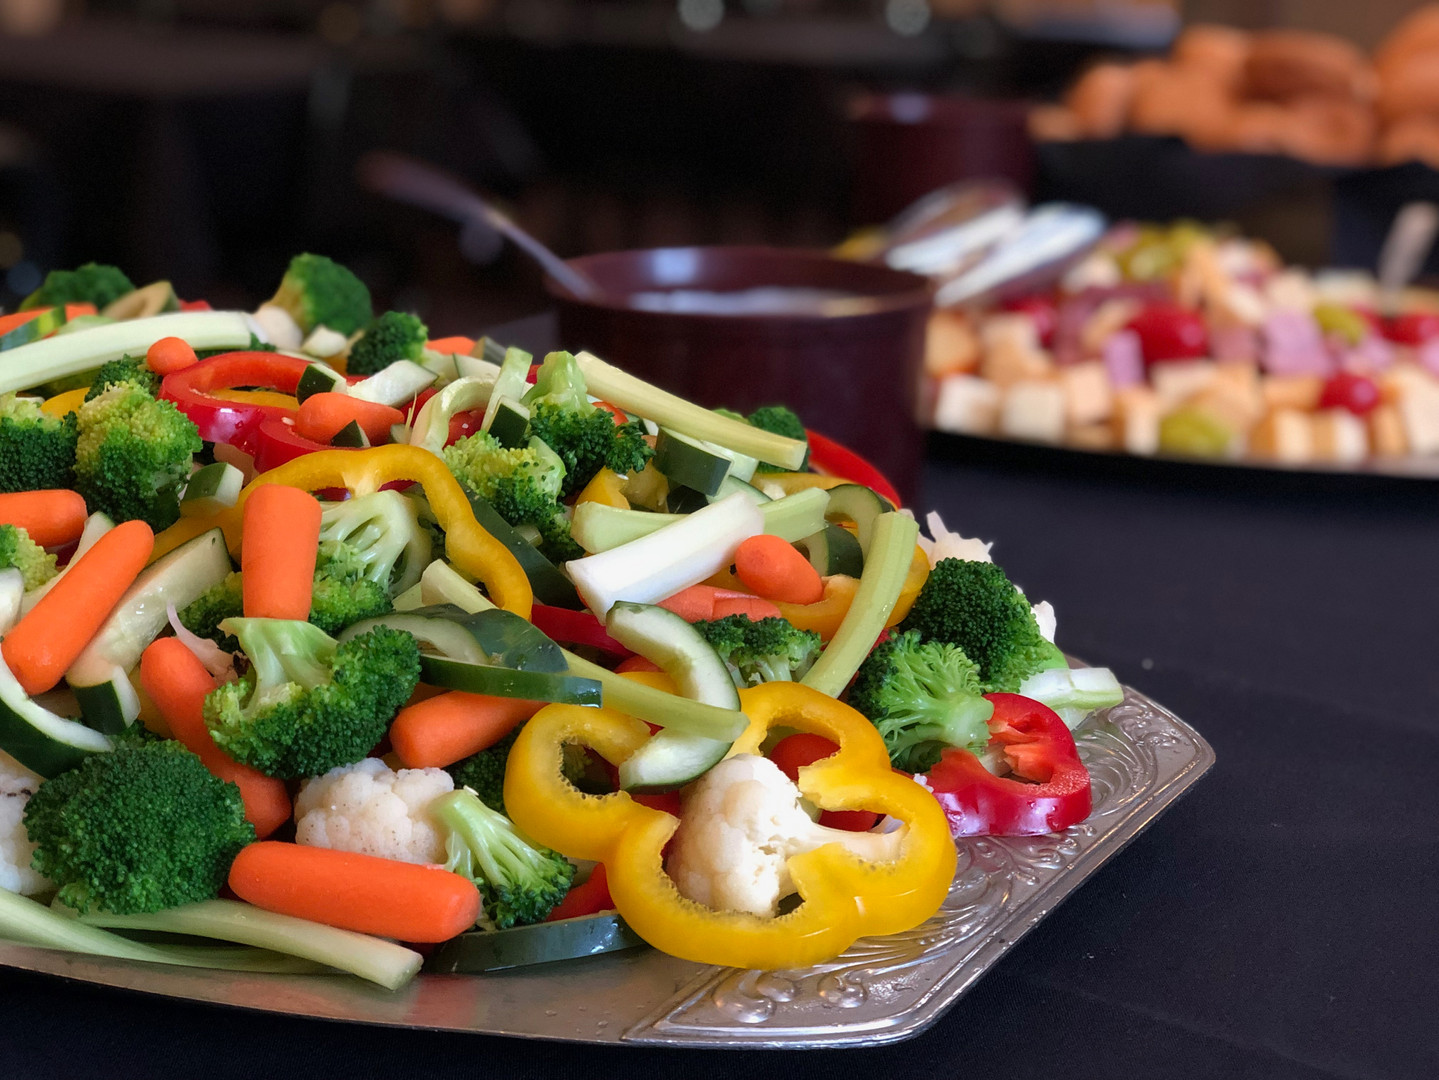 Eisenhalle vegetable tray